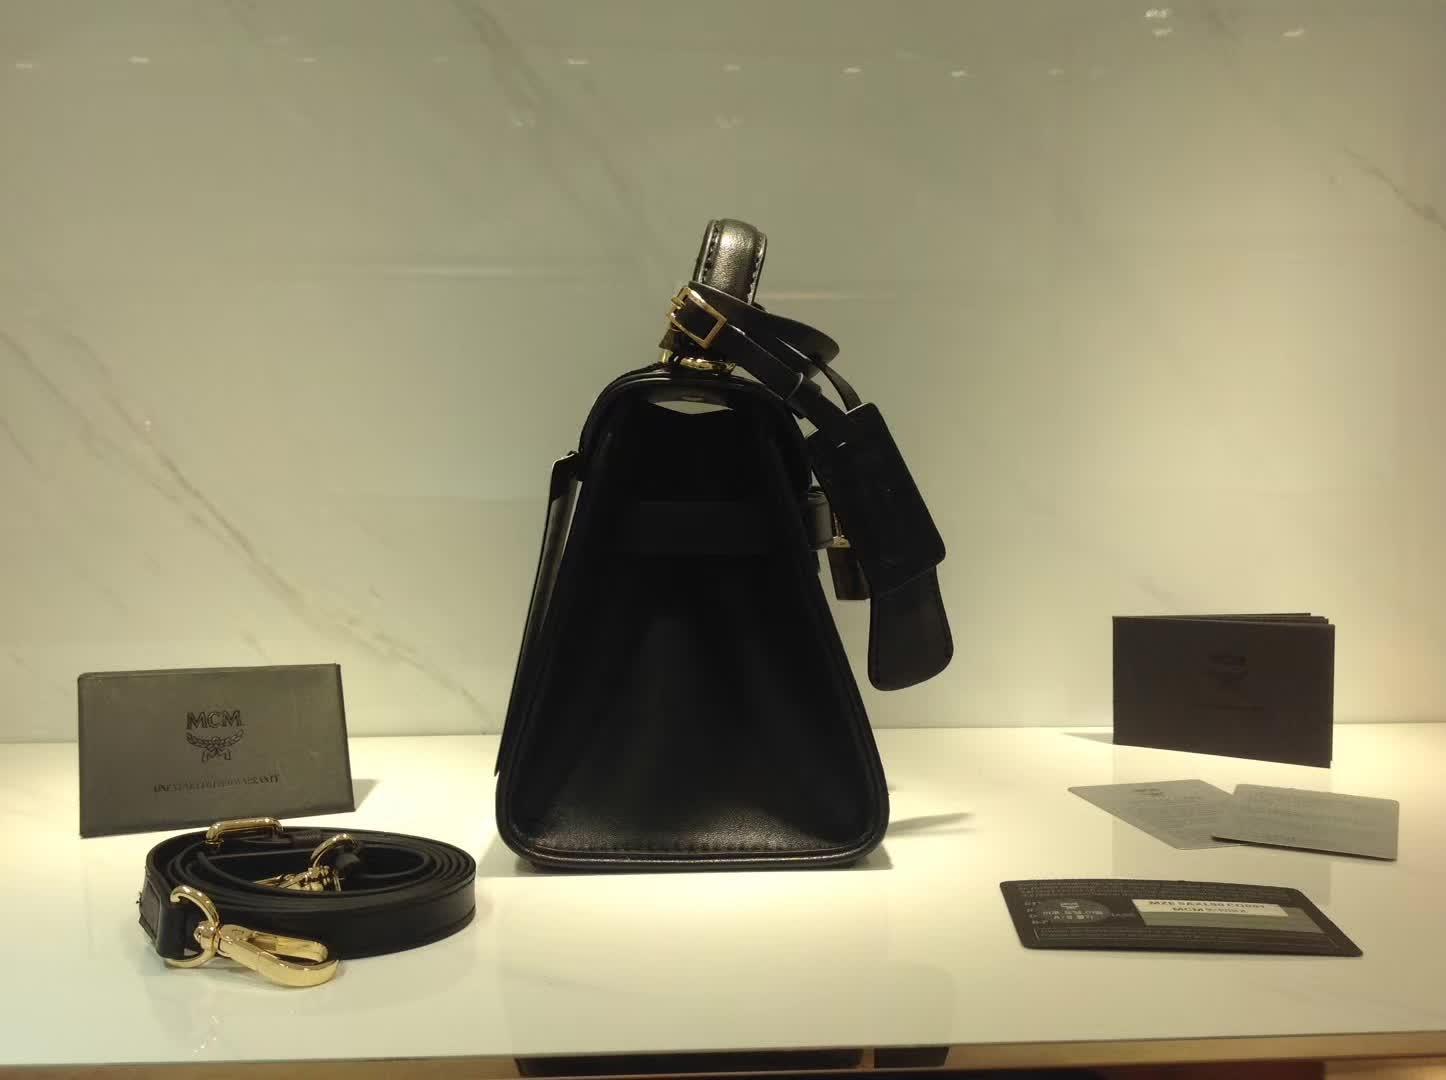 MCM17最新款 HERITAGE高档经典手工制作系列兔子mini kelly 铜牌经典款 黑色